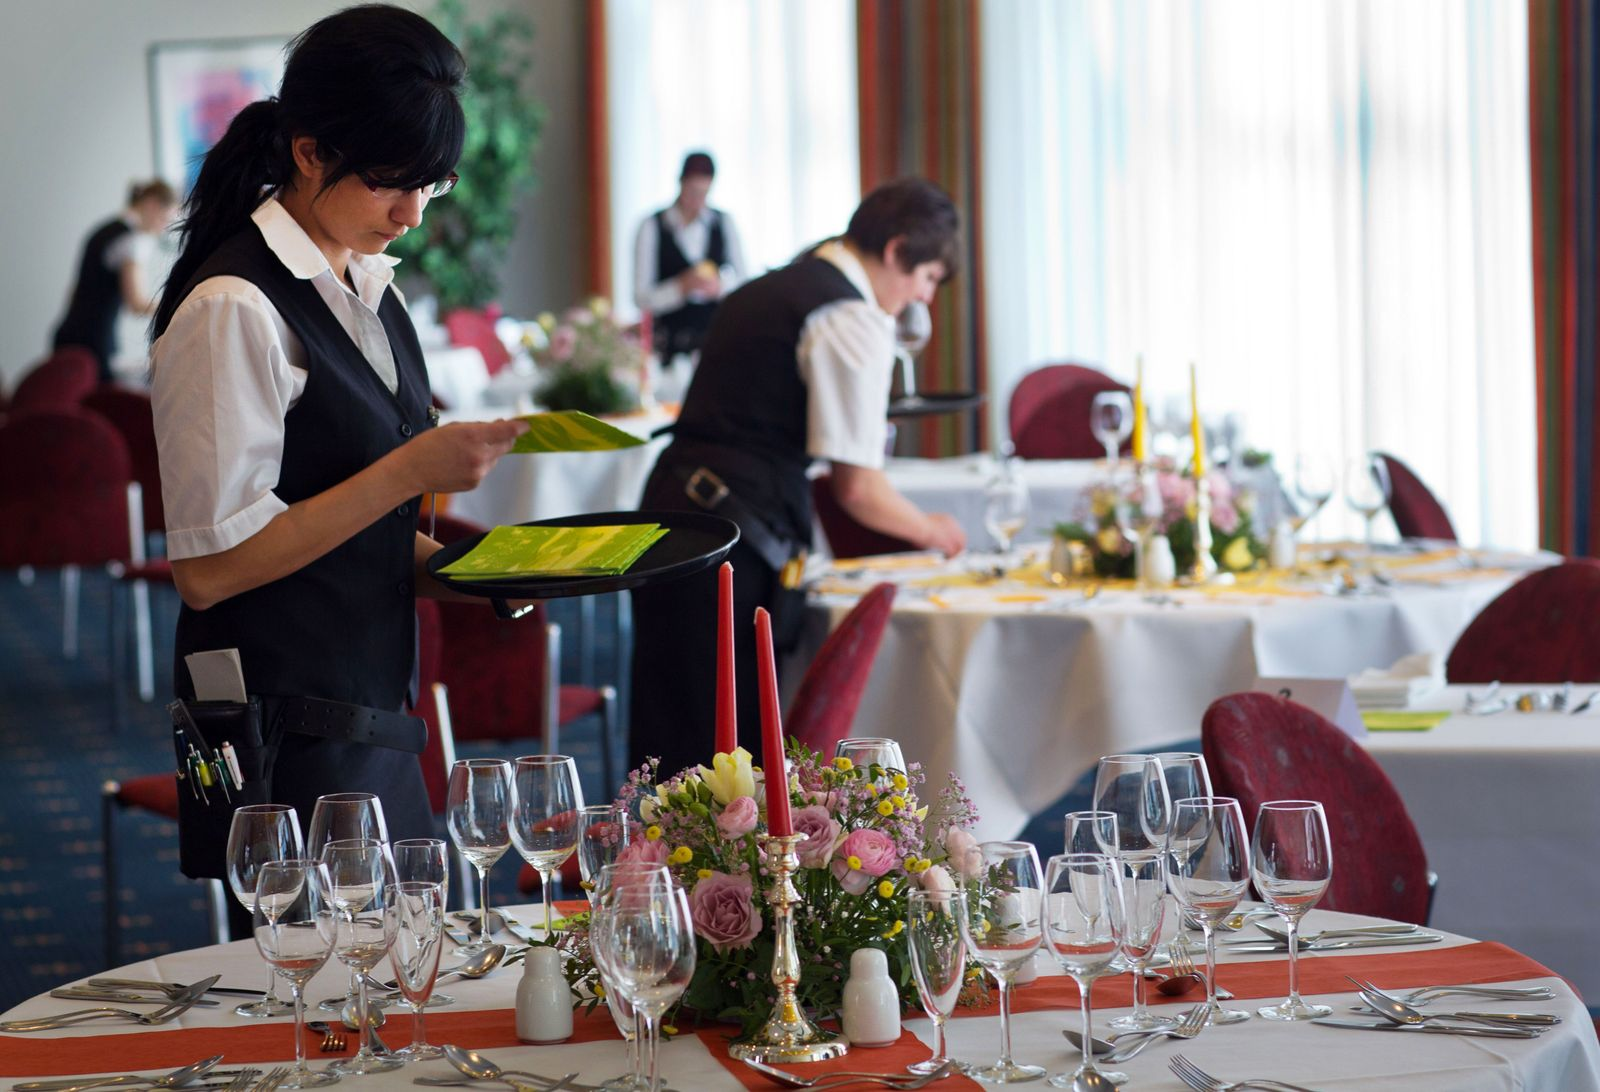 Lehrling / Hotel / Gastronomie